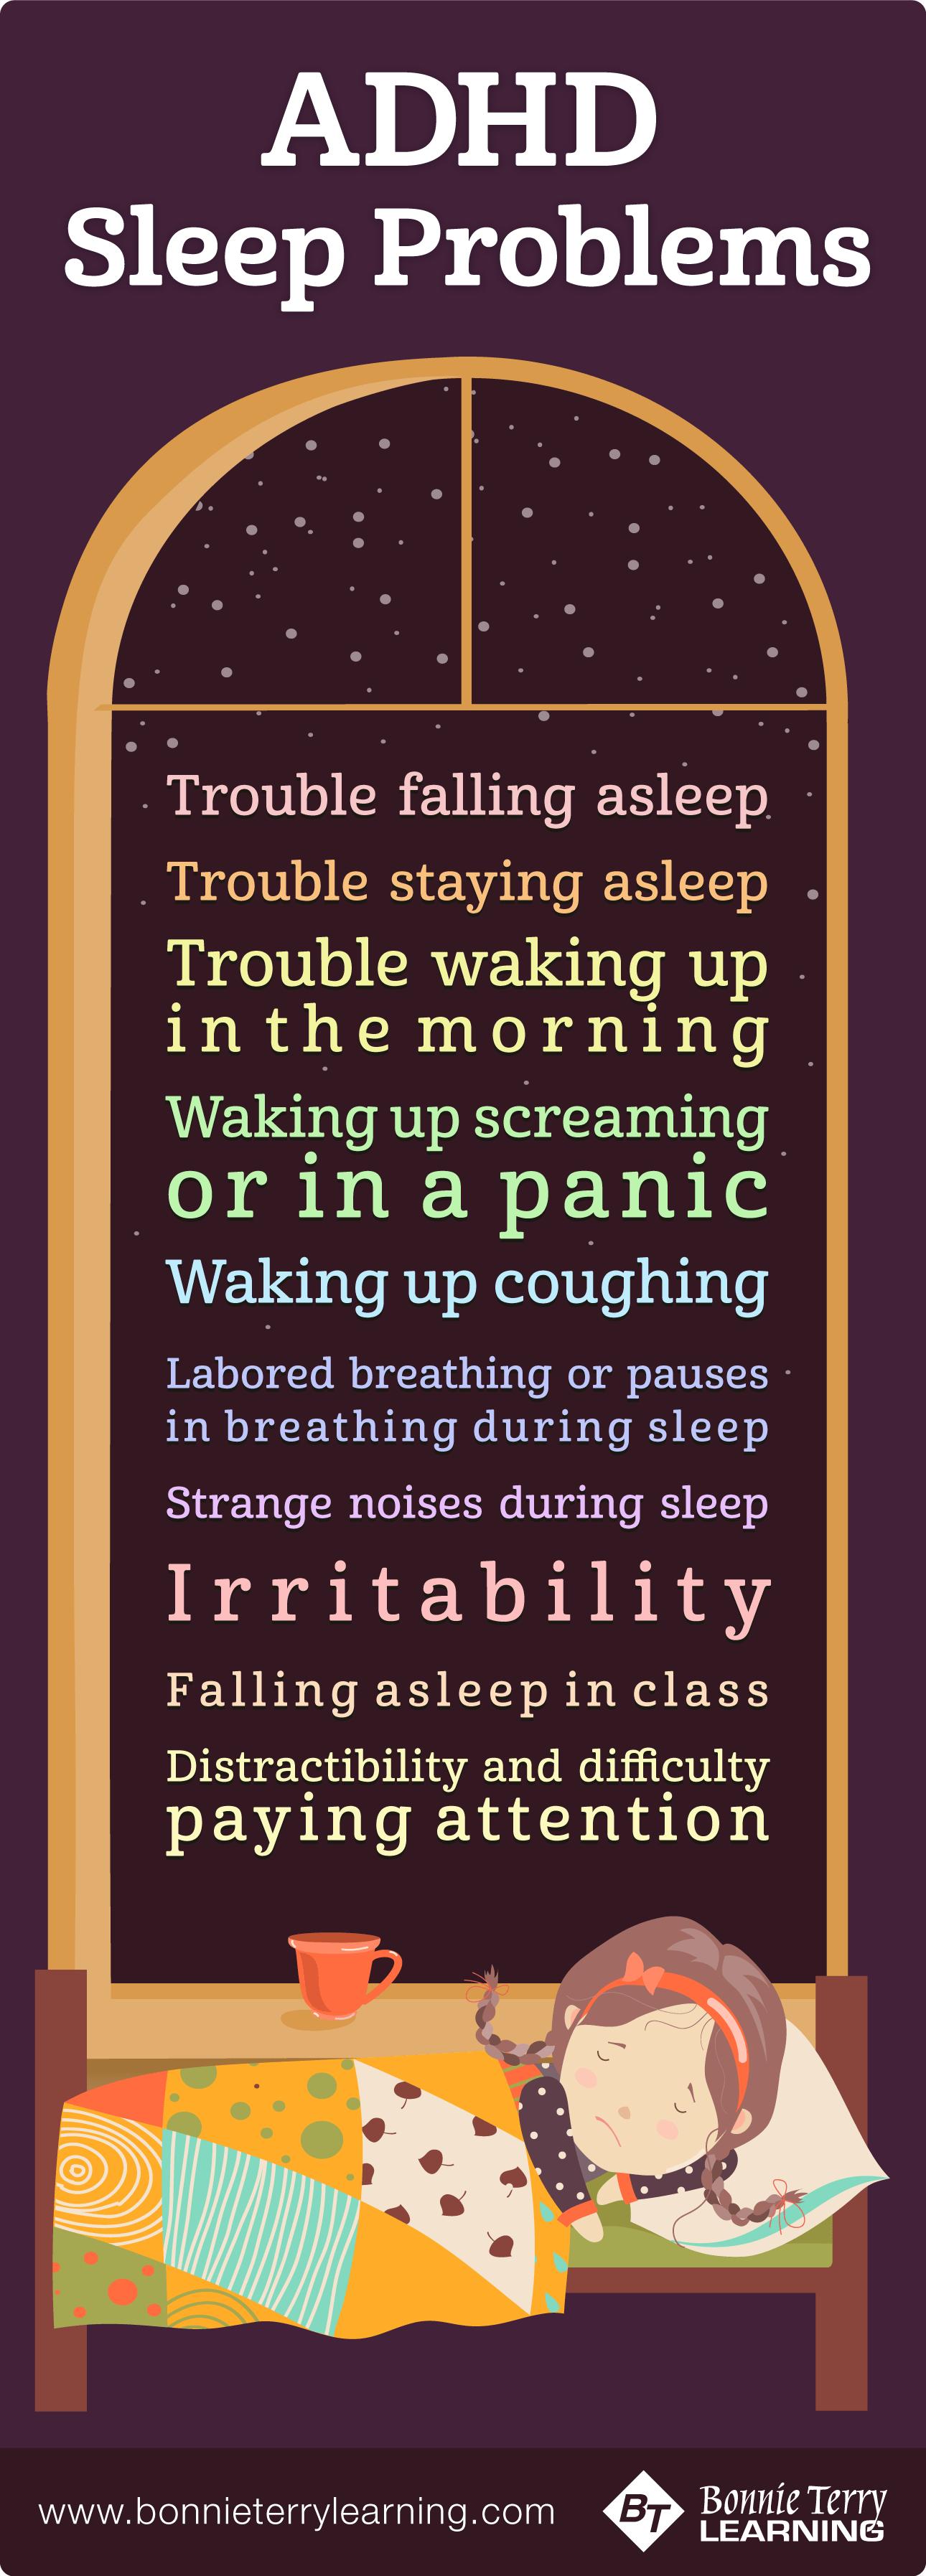 ADHD Sleep Problems and Symptoms